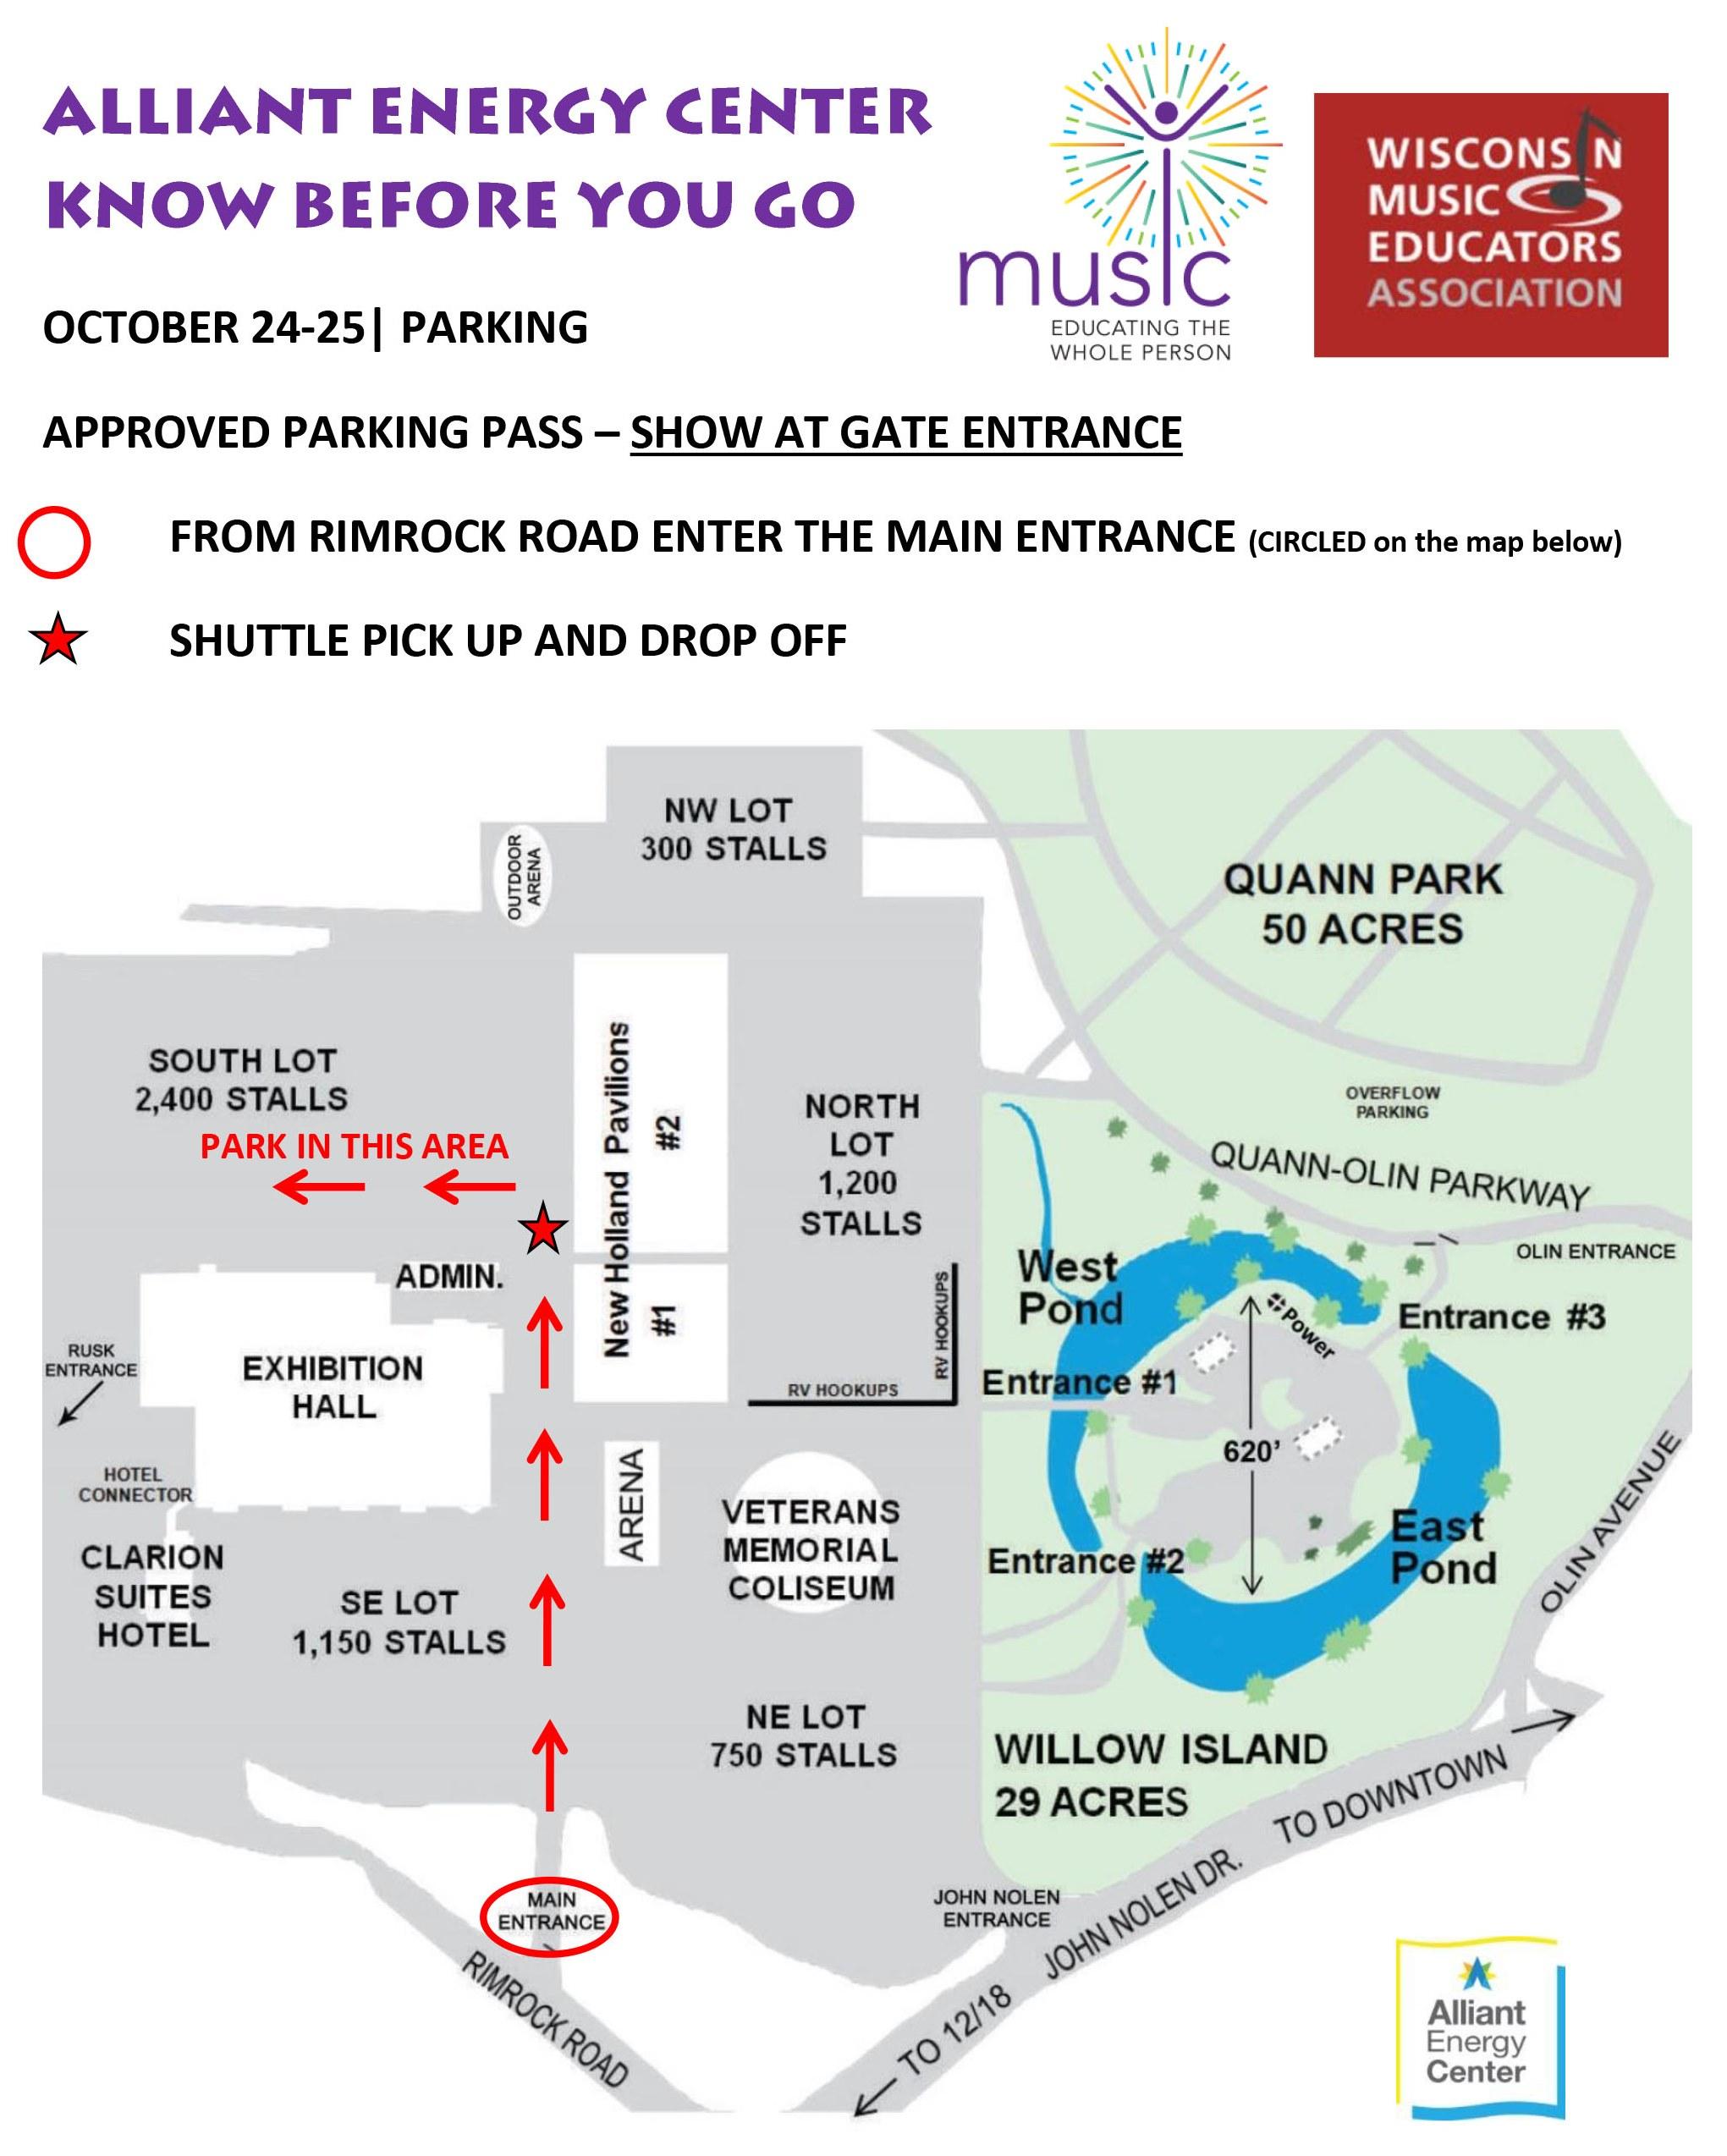 Map & Parking Pass